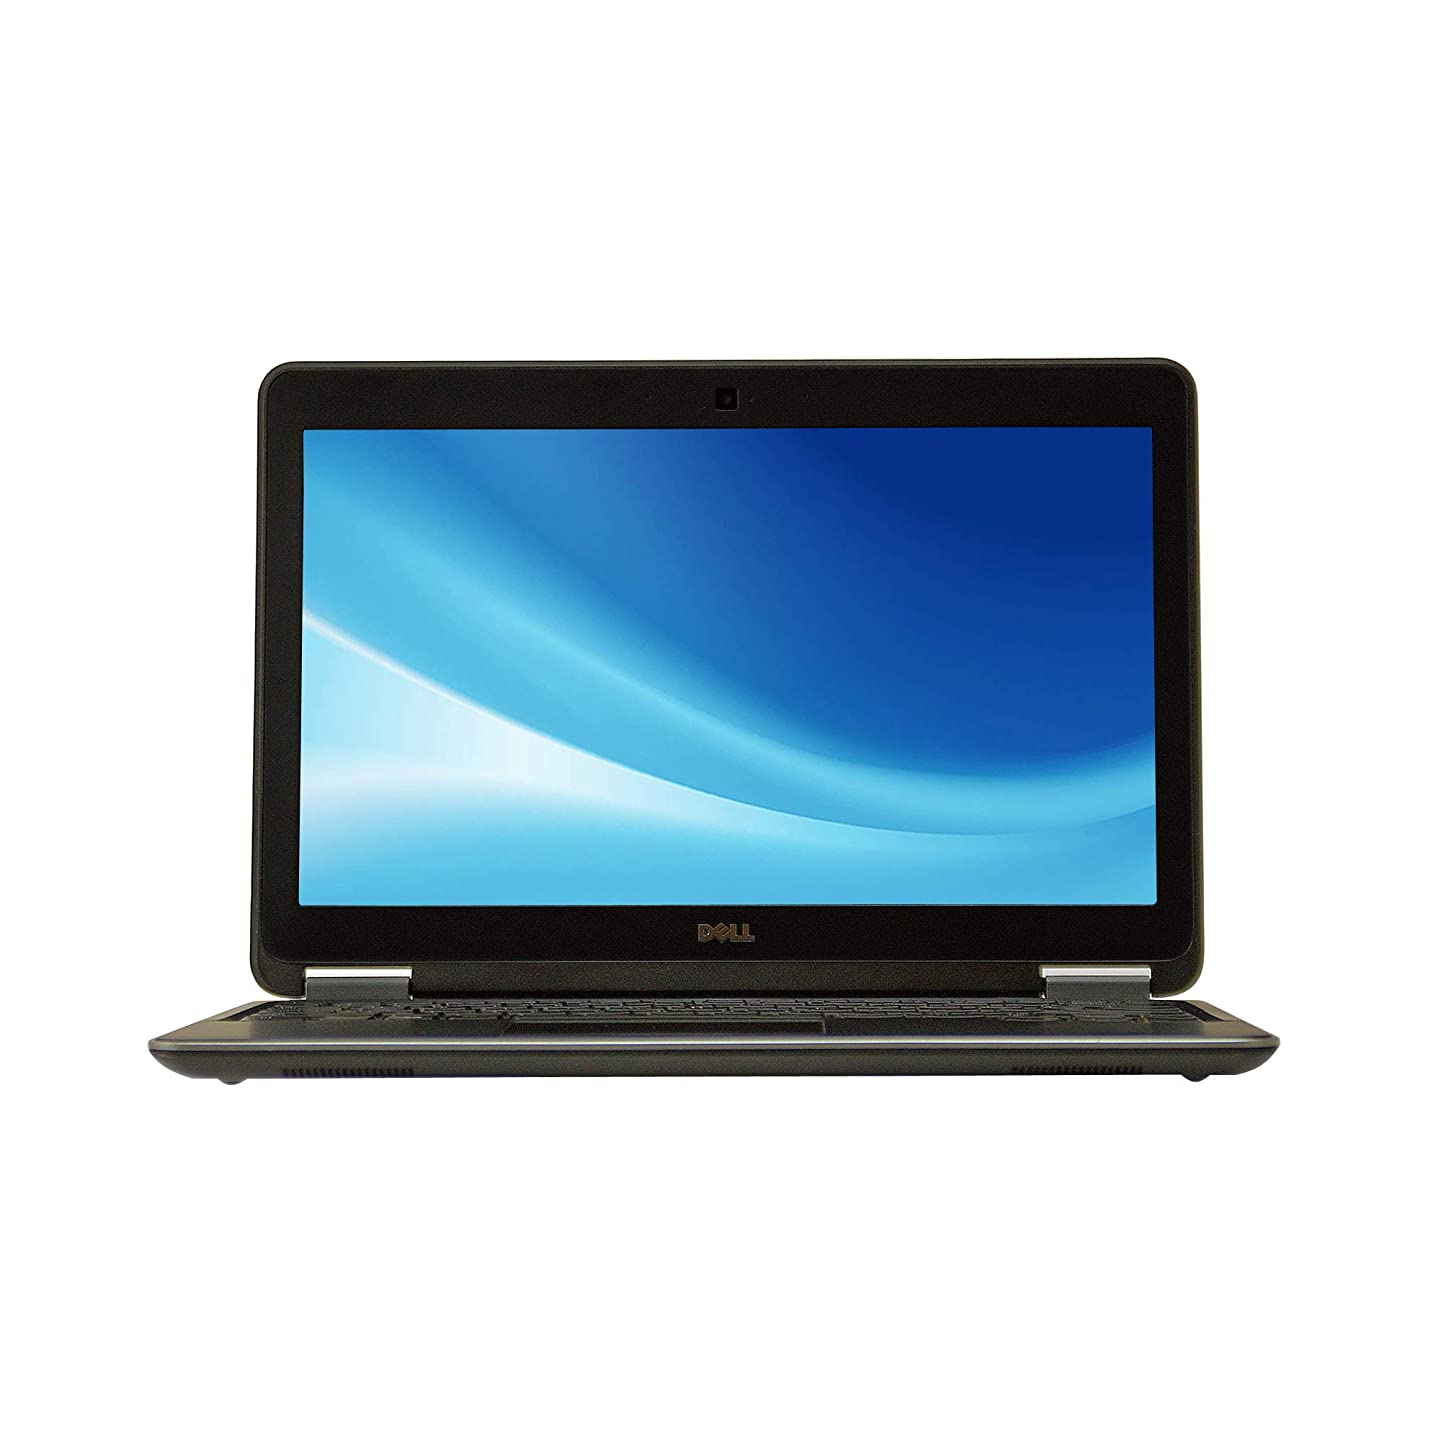 Dell Latitude E7240 12.5in Laptop, Core i5-4300U 1.9GHz, 8GB Ram, 256GB SSD, Windows 10 Pro 64bit, Webcam (Renewed)